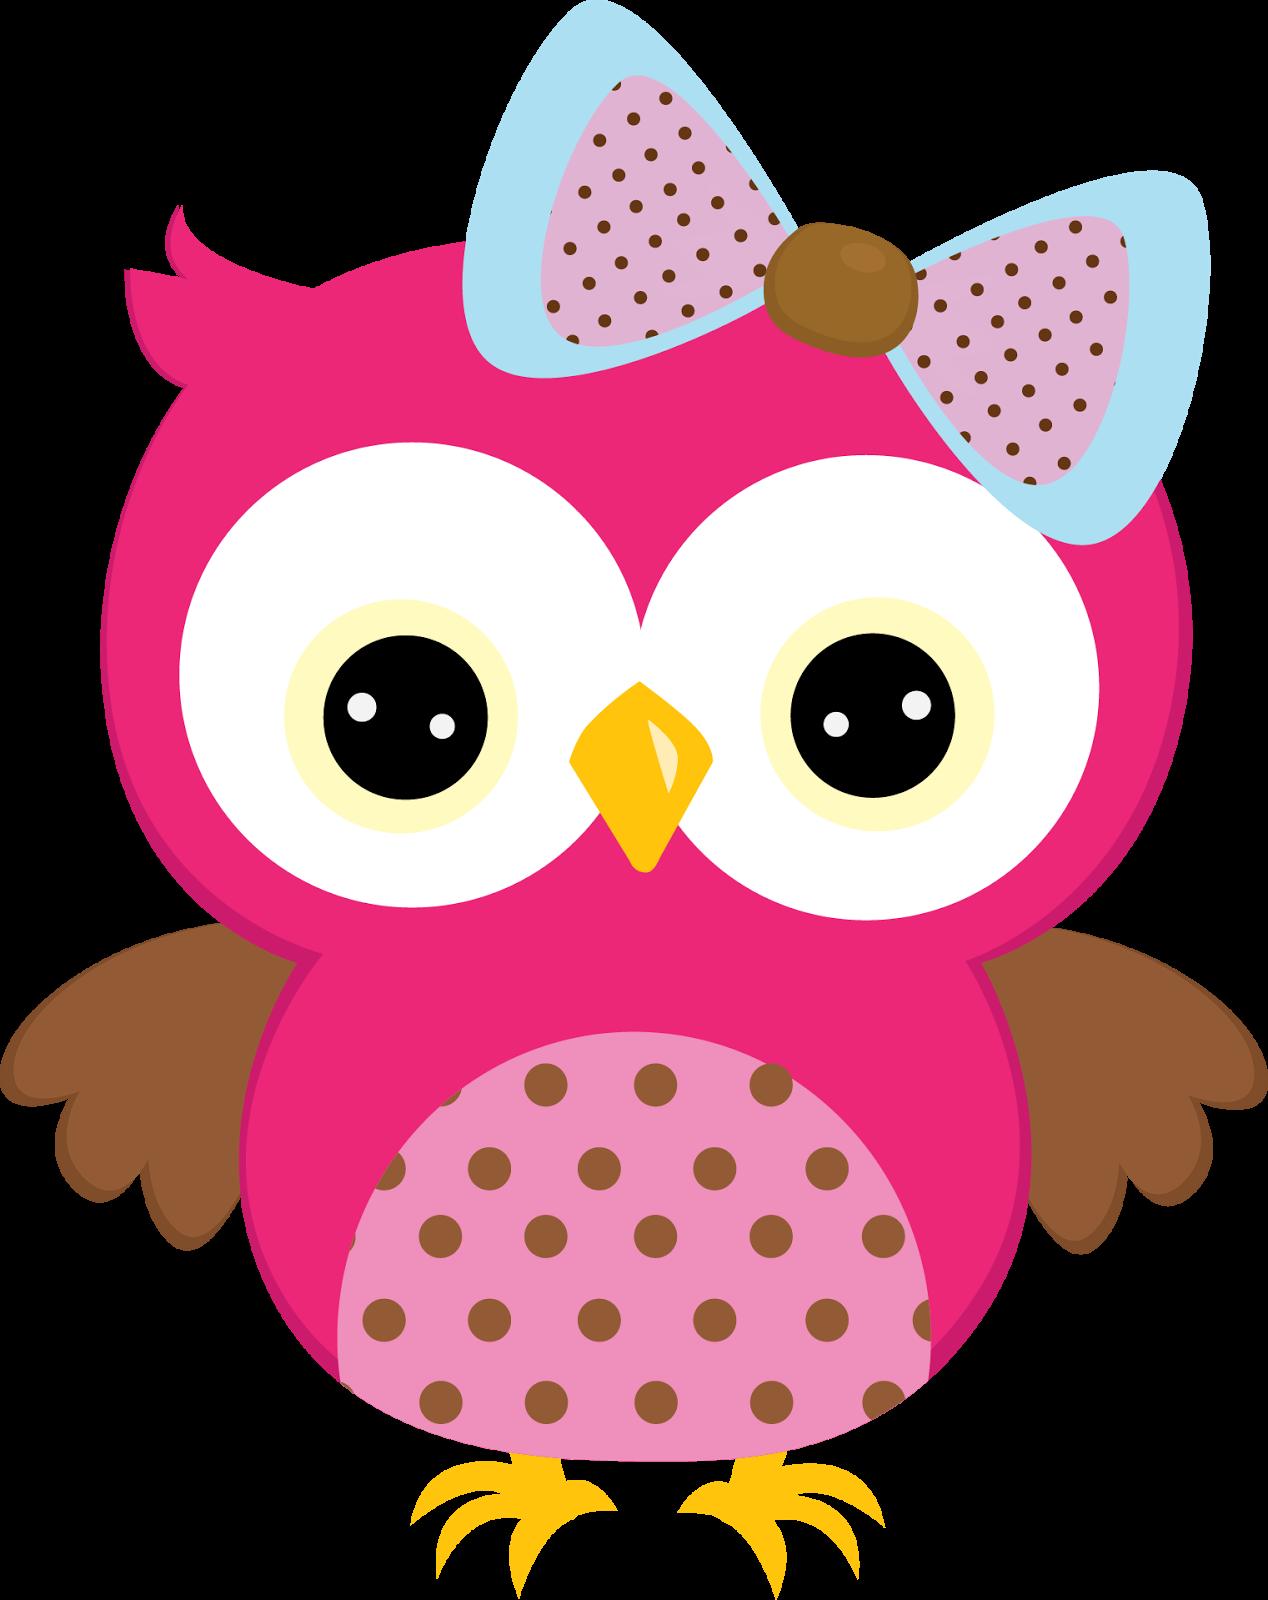 Owl with apple clipart royalty free stock Clipart de Búhos de Colores. | PARA LA ESCUELA | Pinterest ... royalty free stock